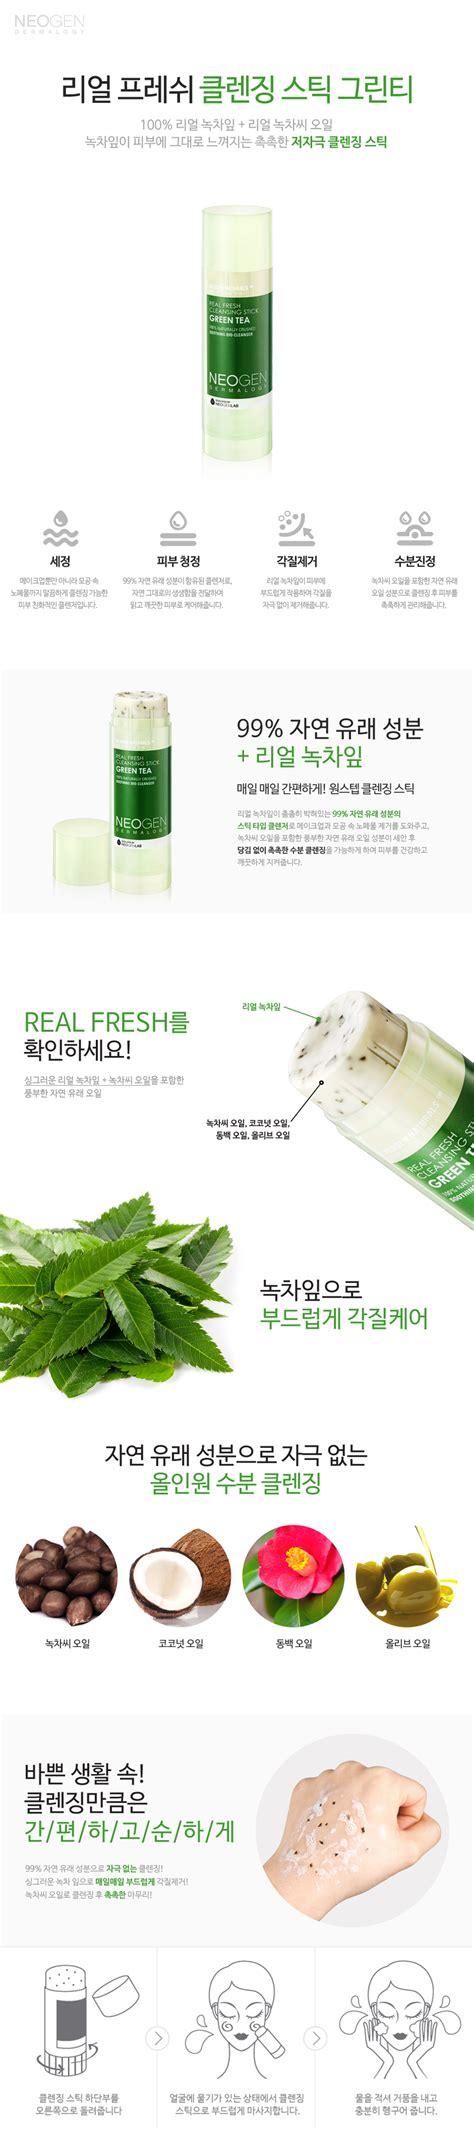 Neogen Real Fresh Green Tea Cleansing Stick 80gr neogen real fresh cleansing stick green tea 80g